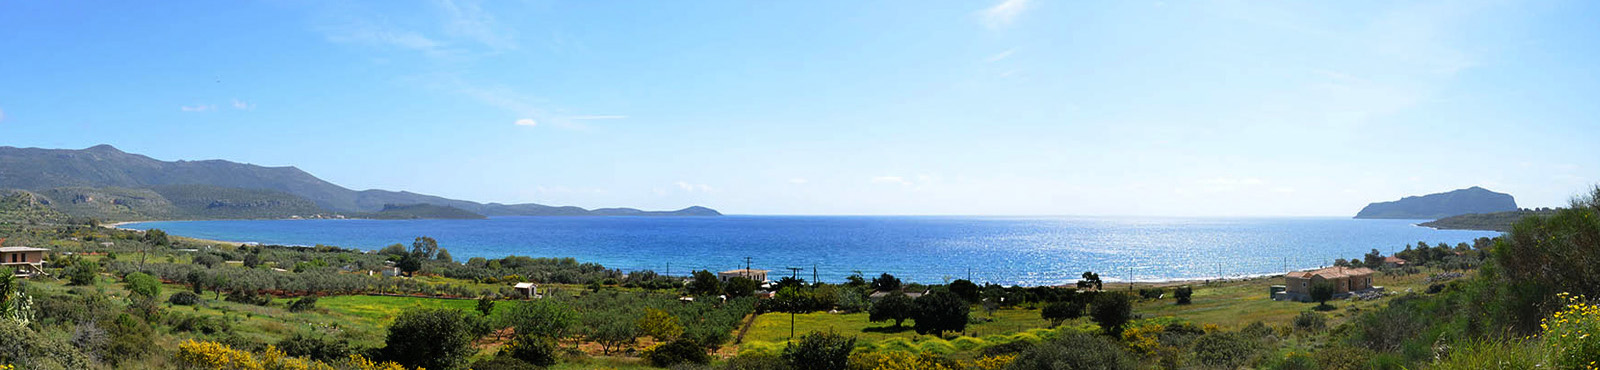 Lakonien im Süden der Halbinsel Peloponnes